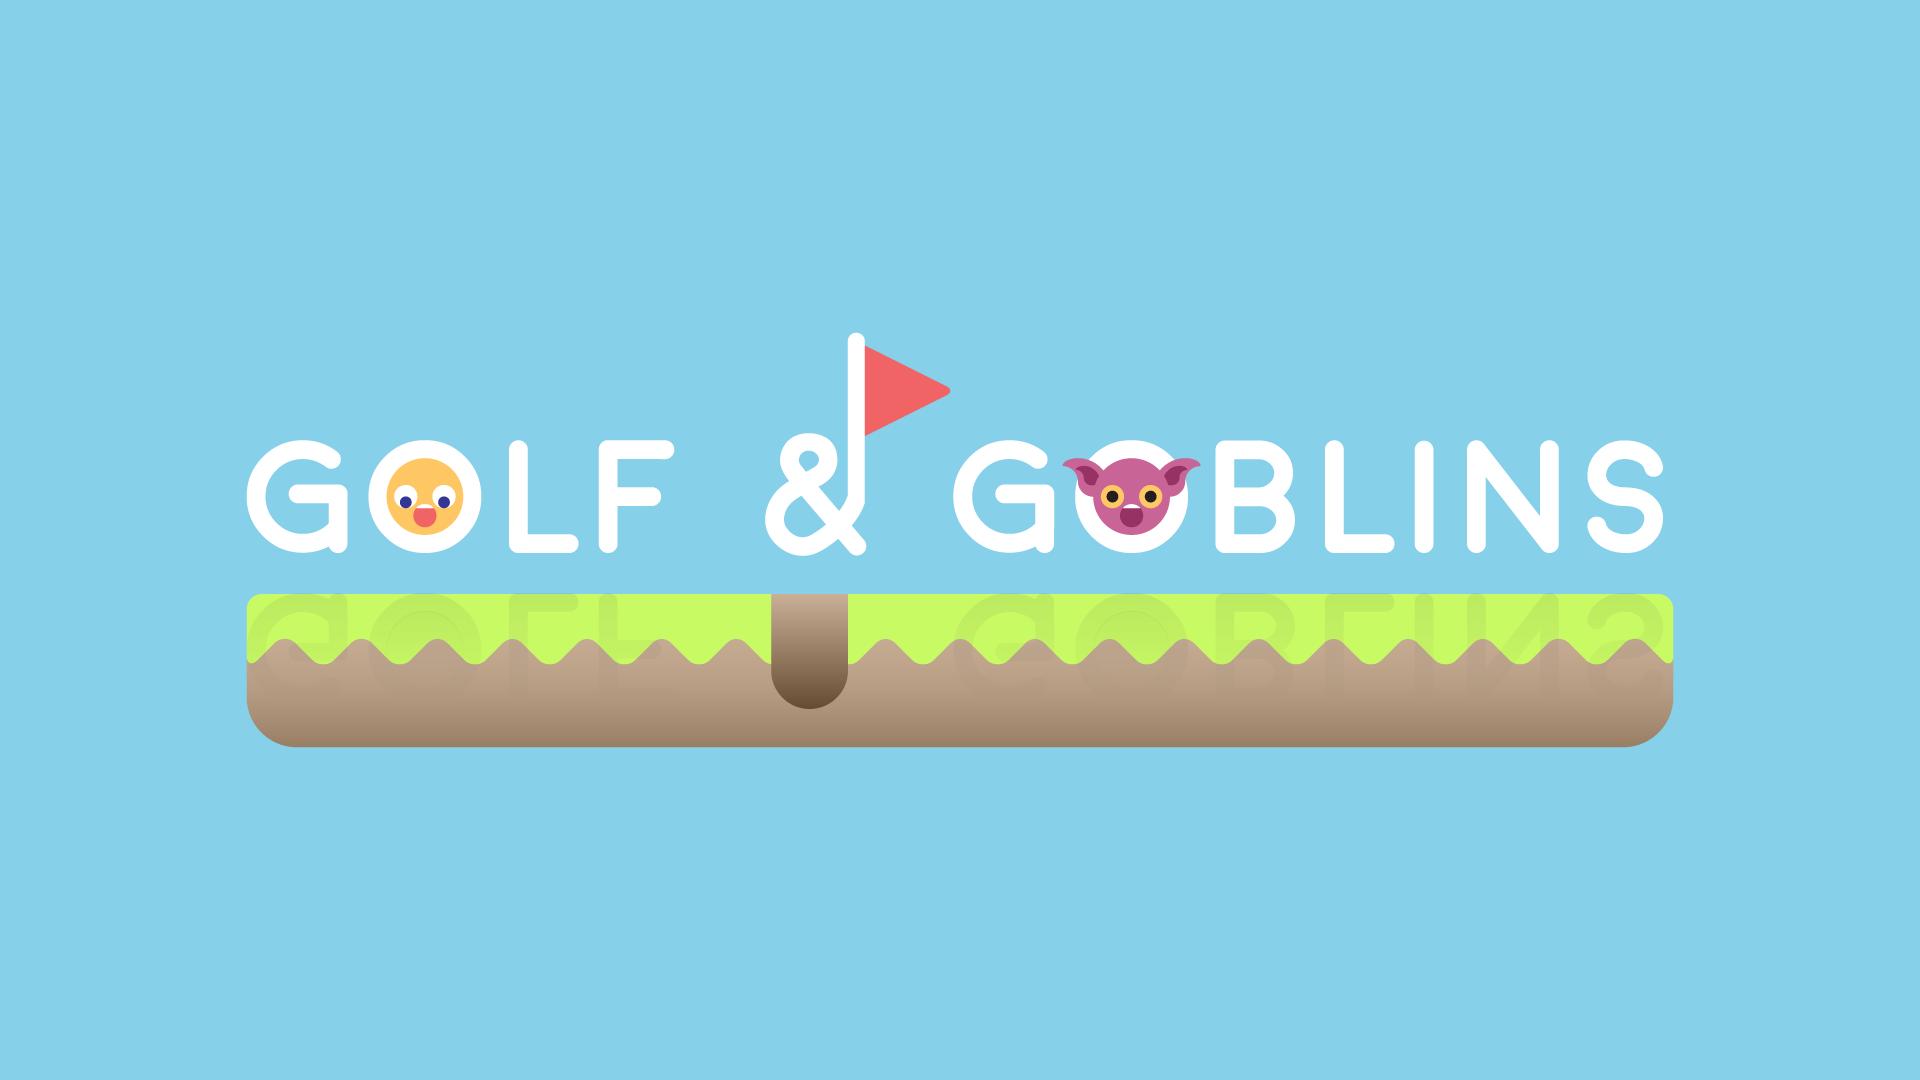 Golf & Goblins